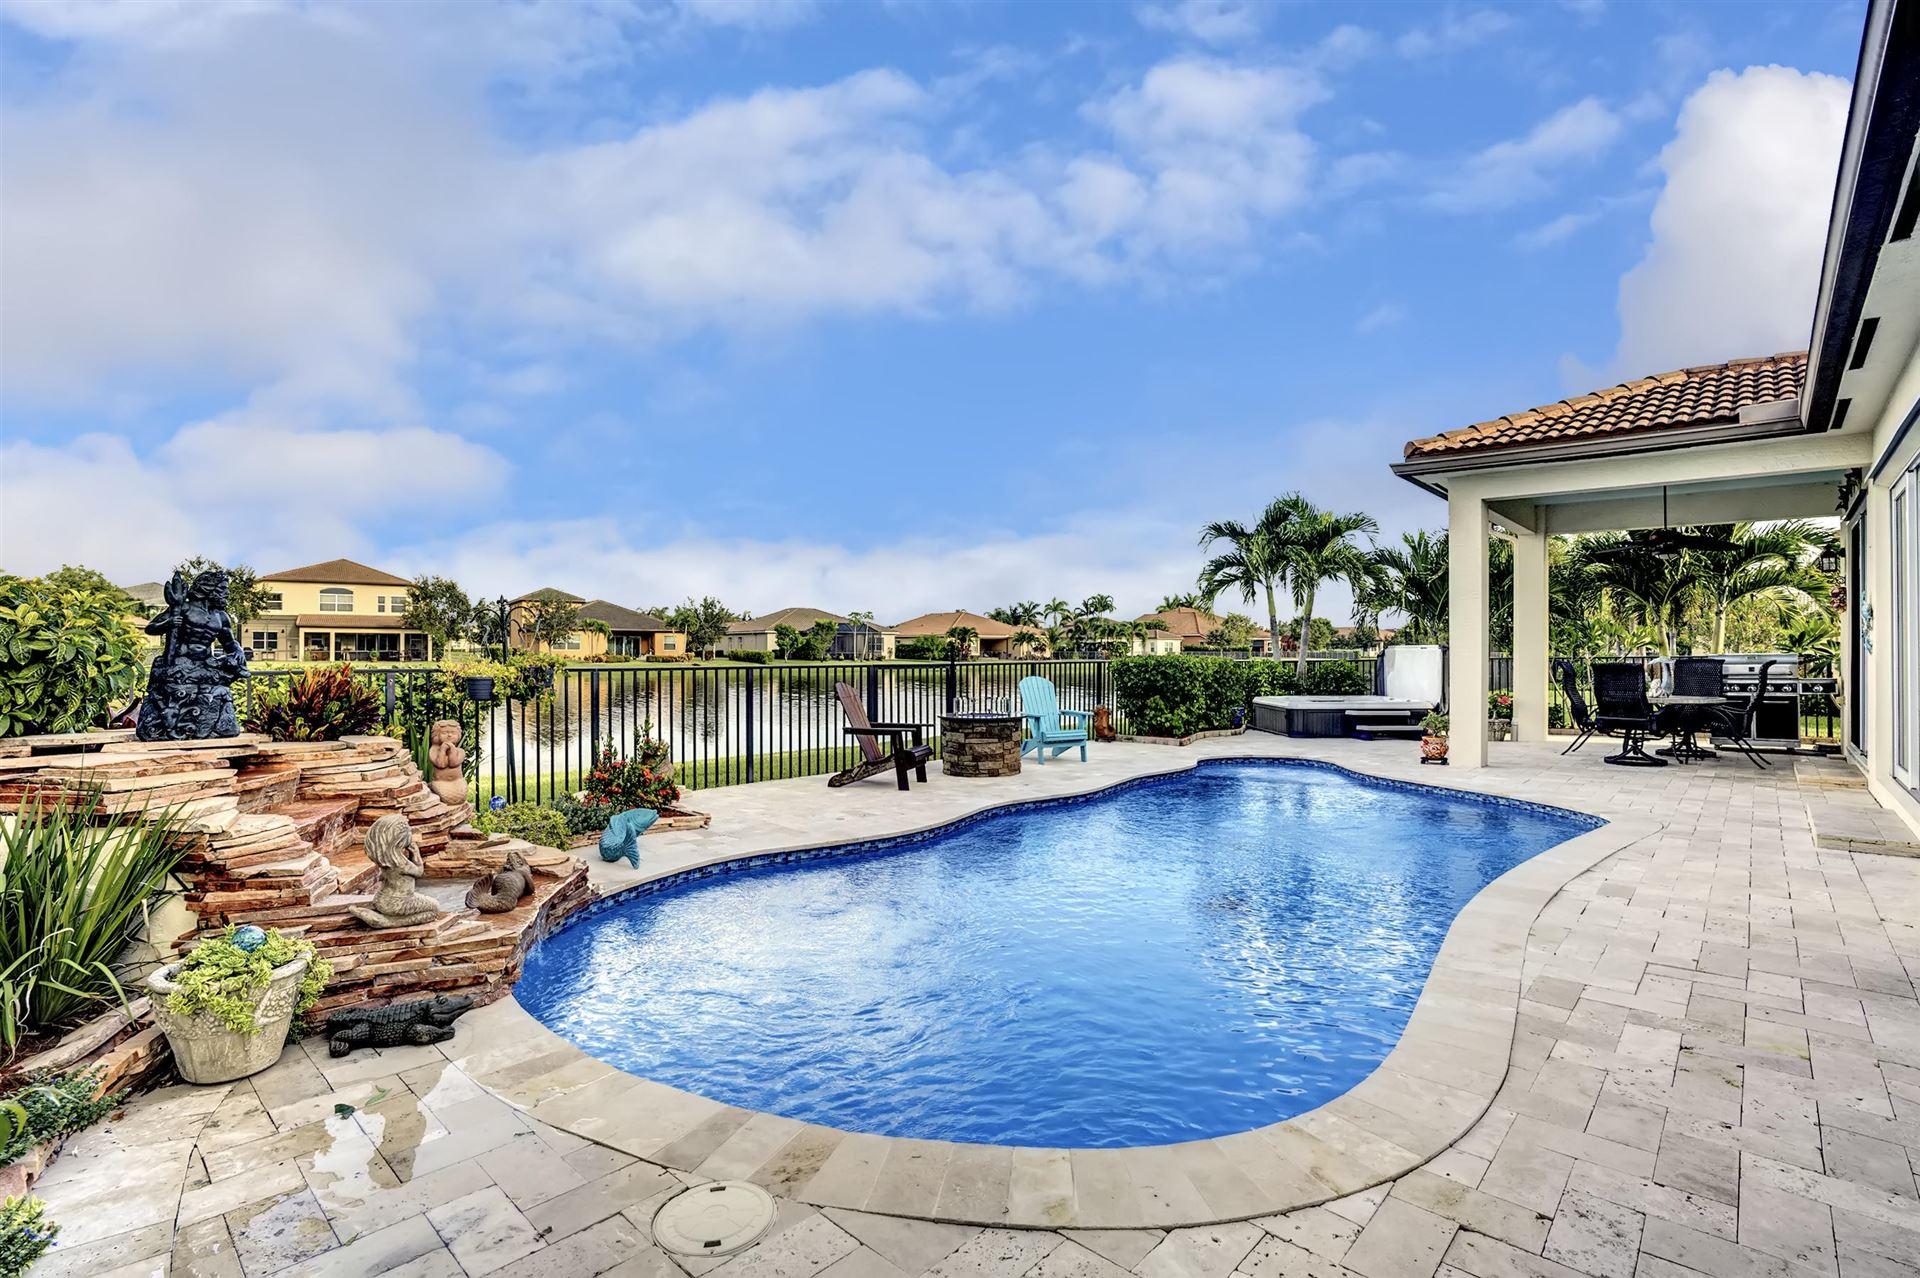 2366 Bellarosa Circle, Royal Palm Beach, FL 33411 - #: RX-10654670